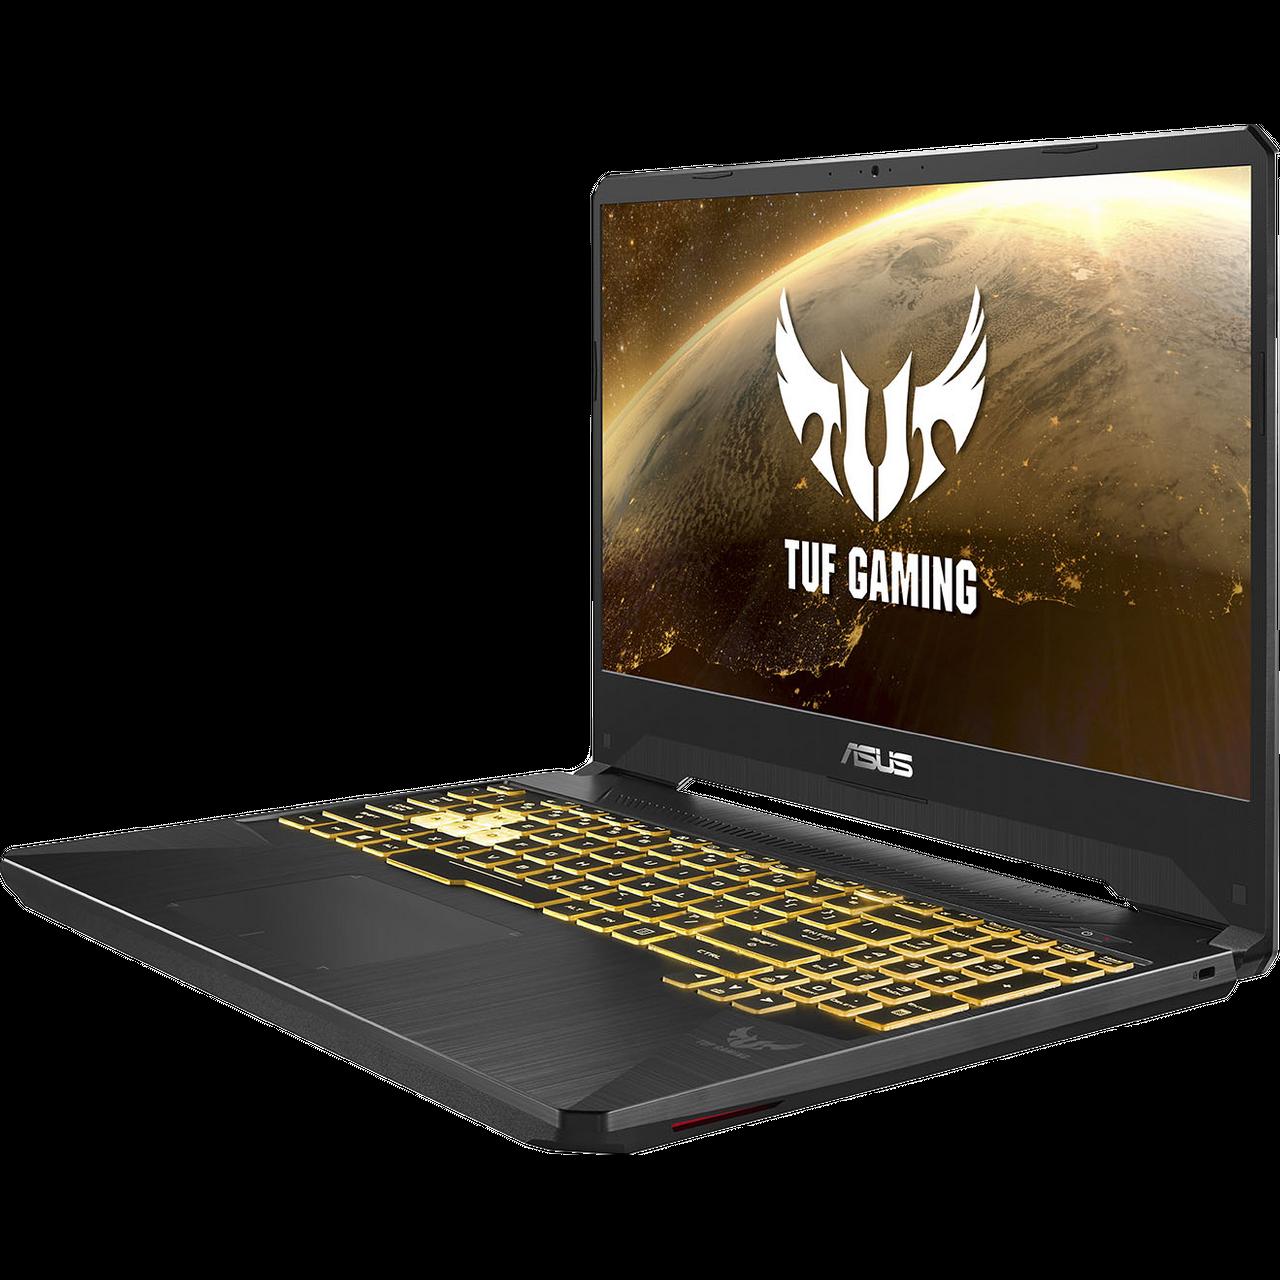 "Asus 15.6"" Laptop NVidia GeForce GTX 1650 AMD Ryzen 5 512GB Solid State Drive 8GB RAM"